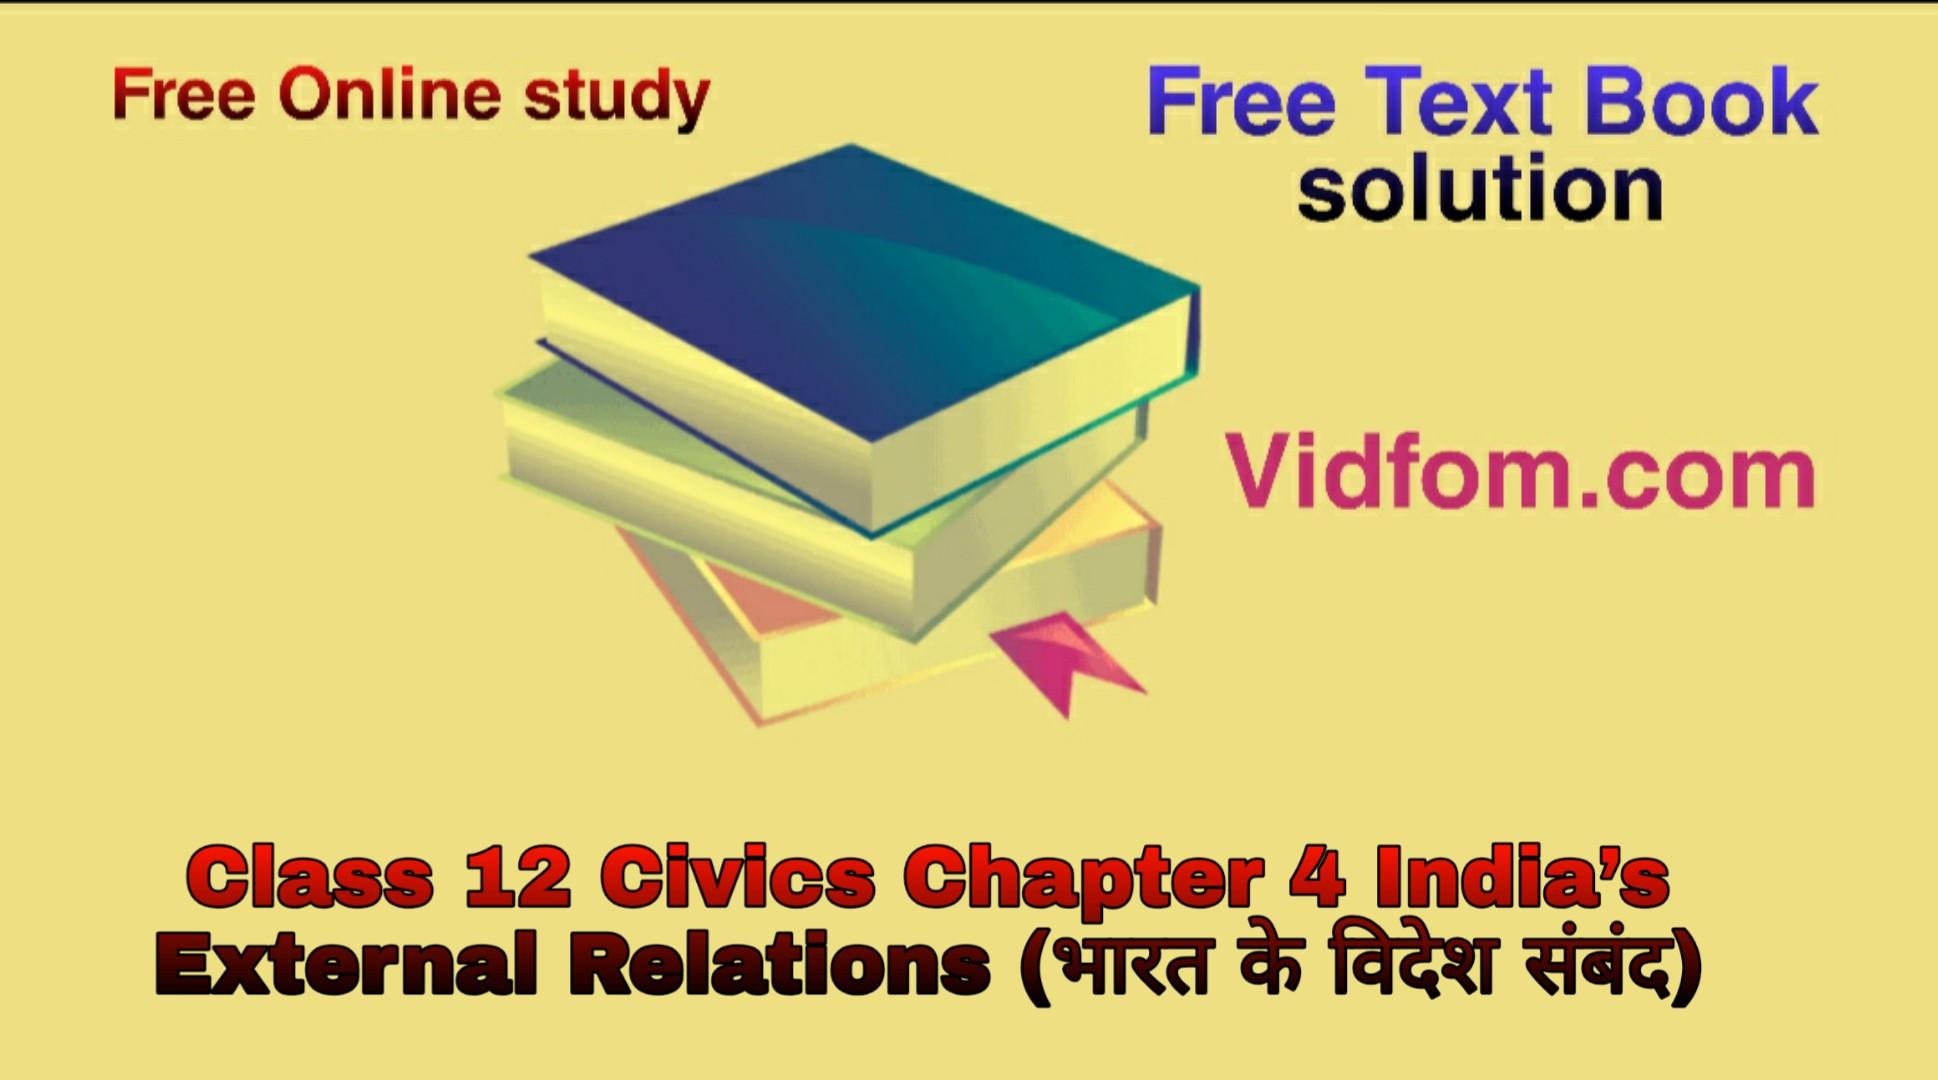 Class 12 Civics Chapter 4 India's External Relations (भारत के विदेश संबंद)